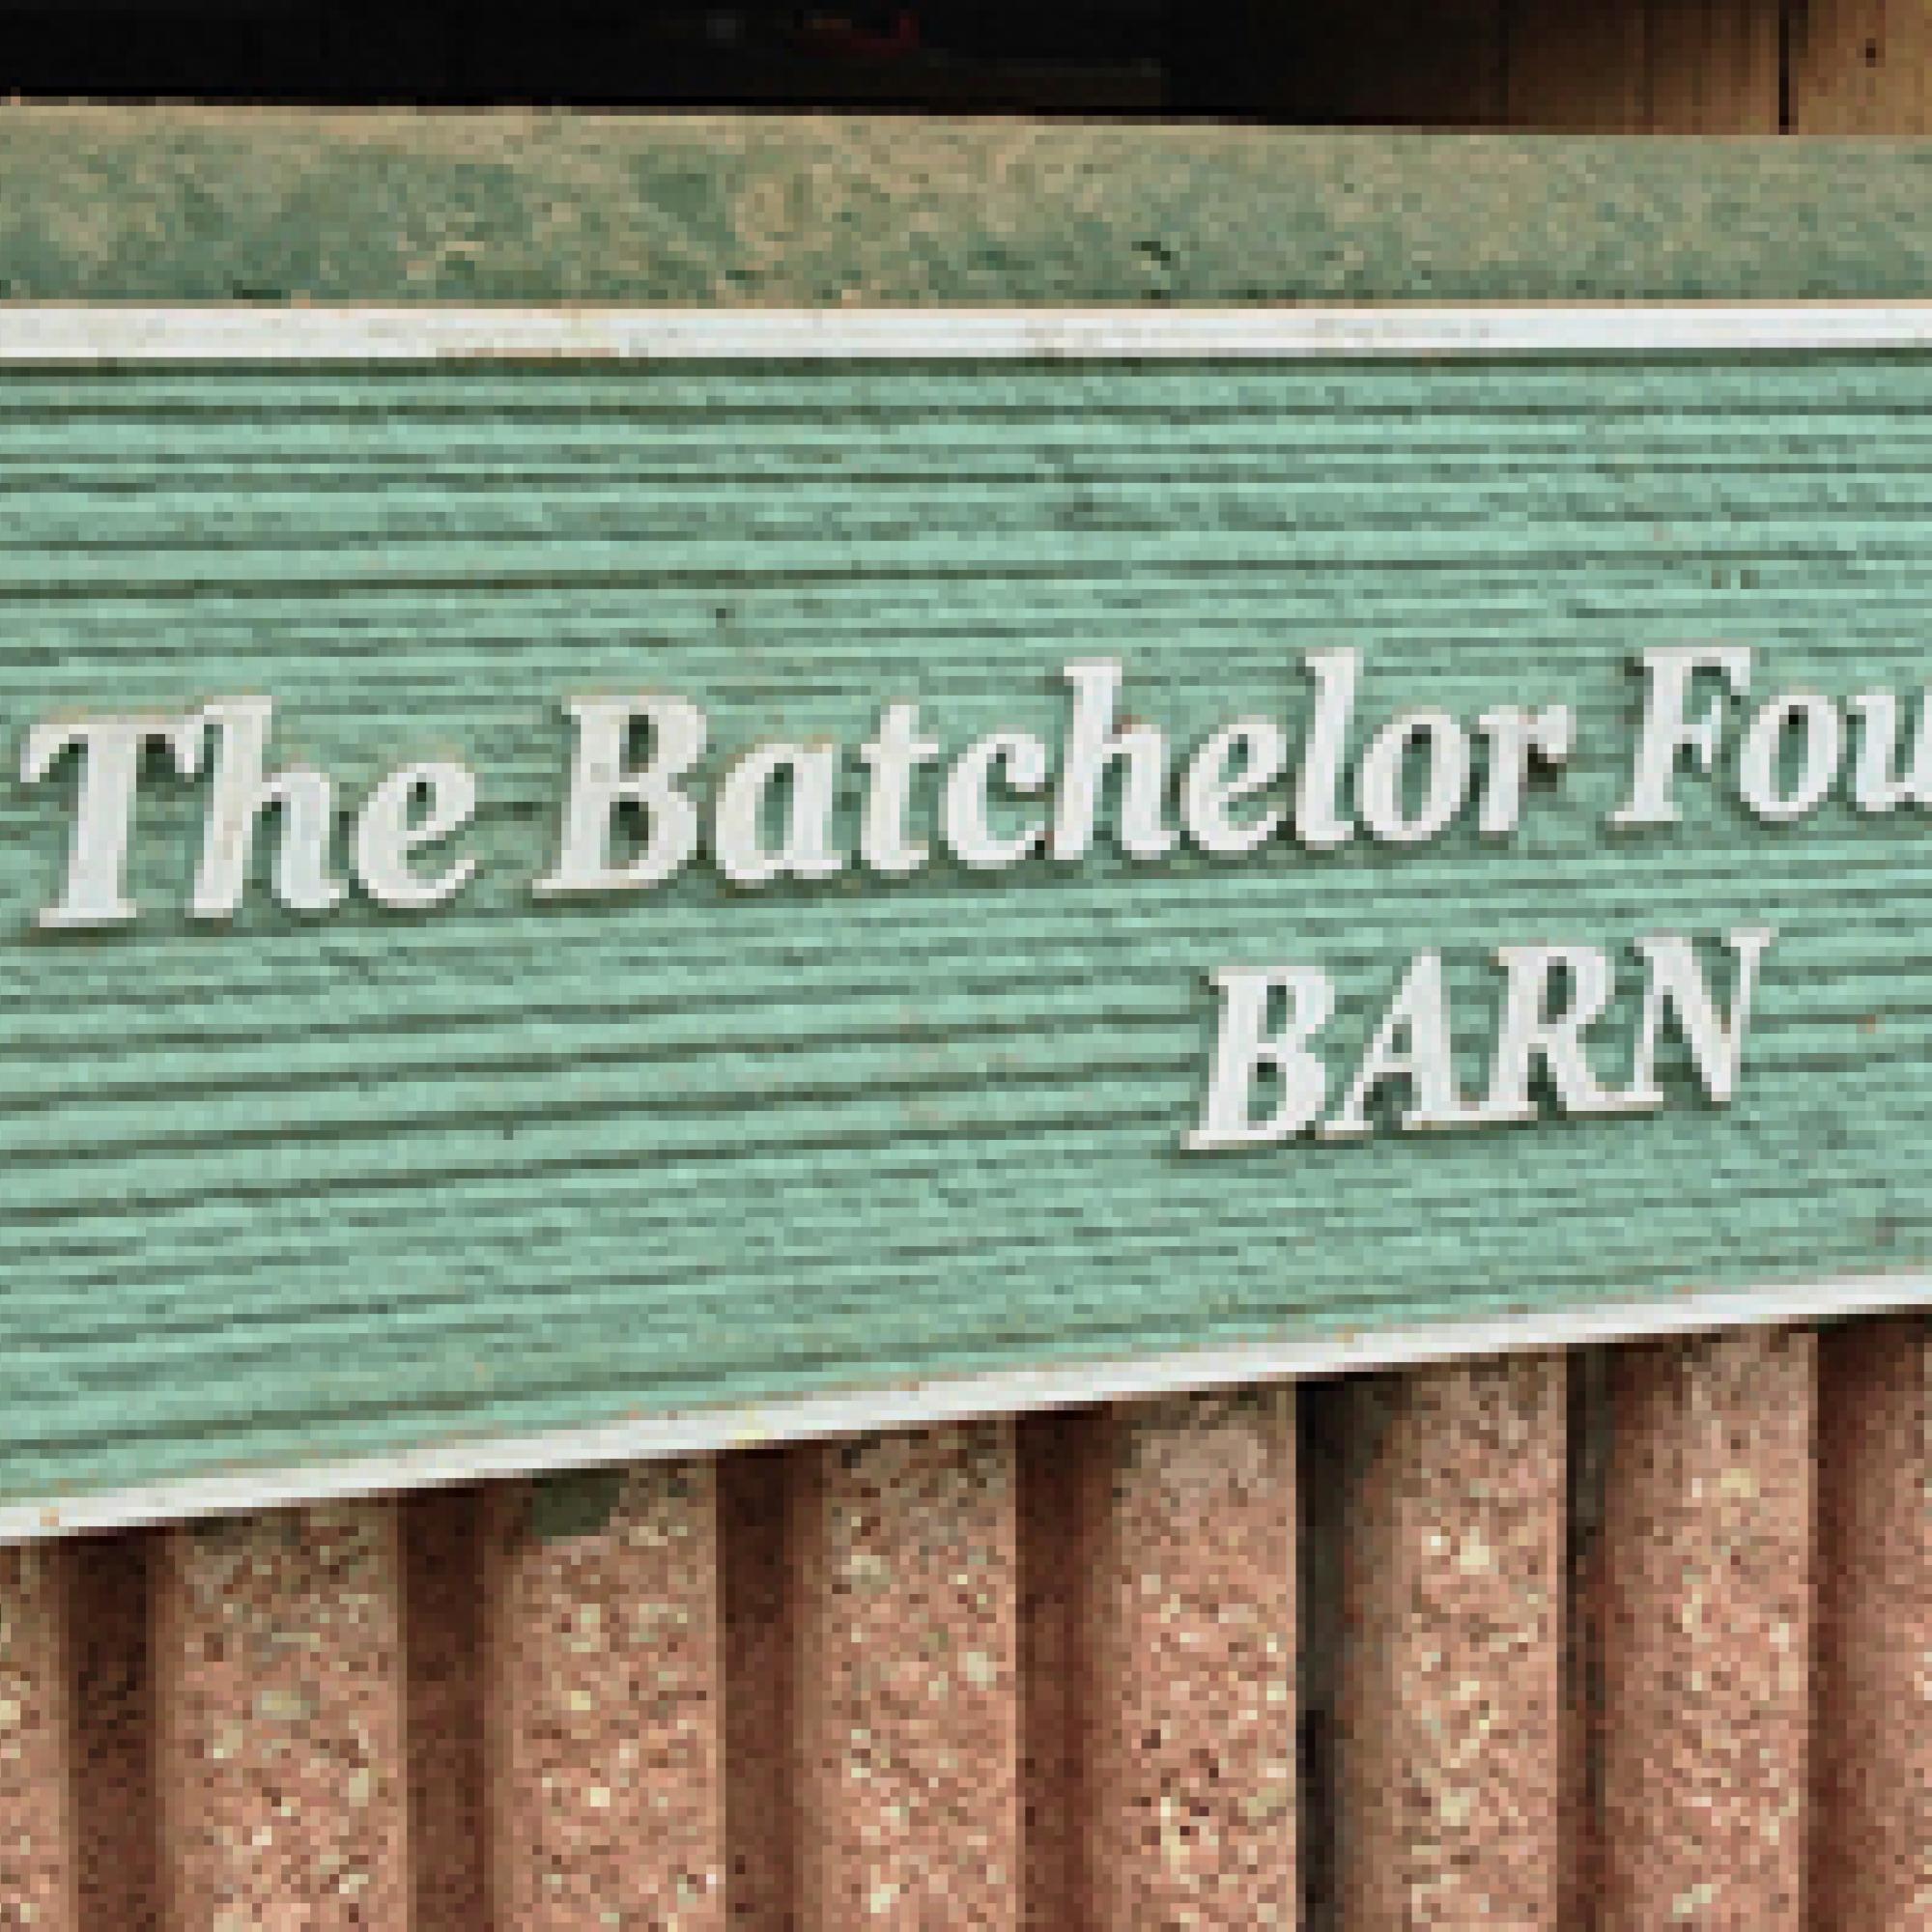 The Batchelor Foundation North Barn